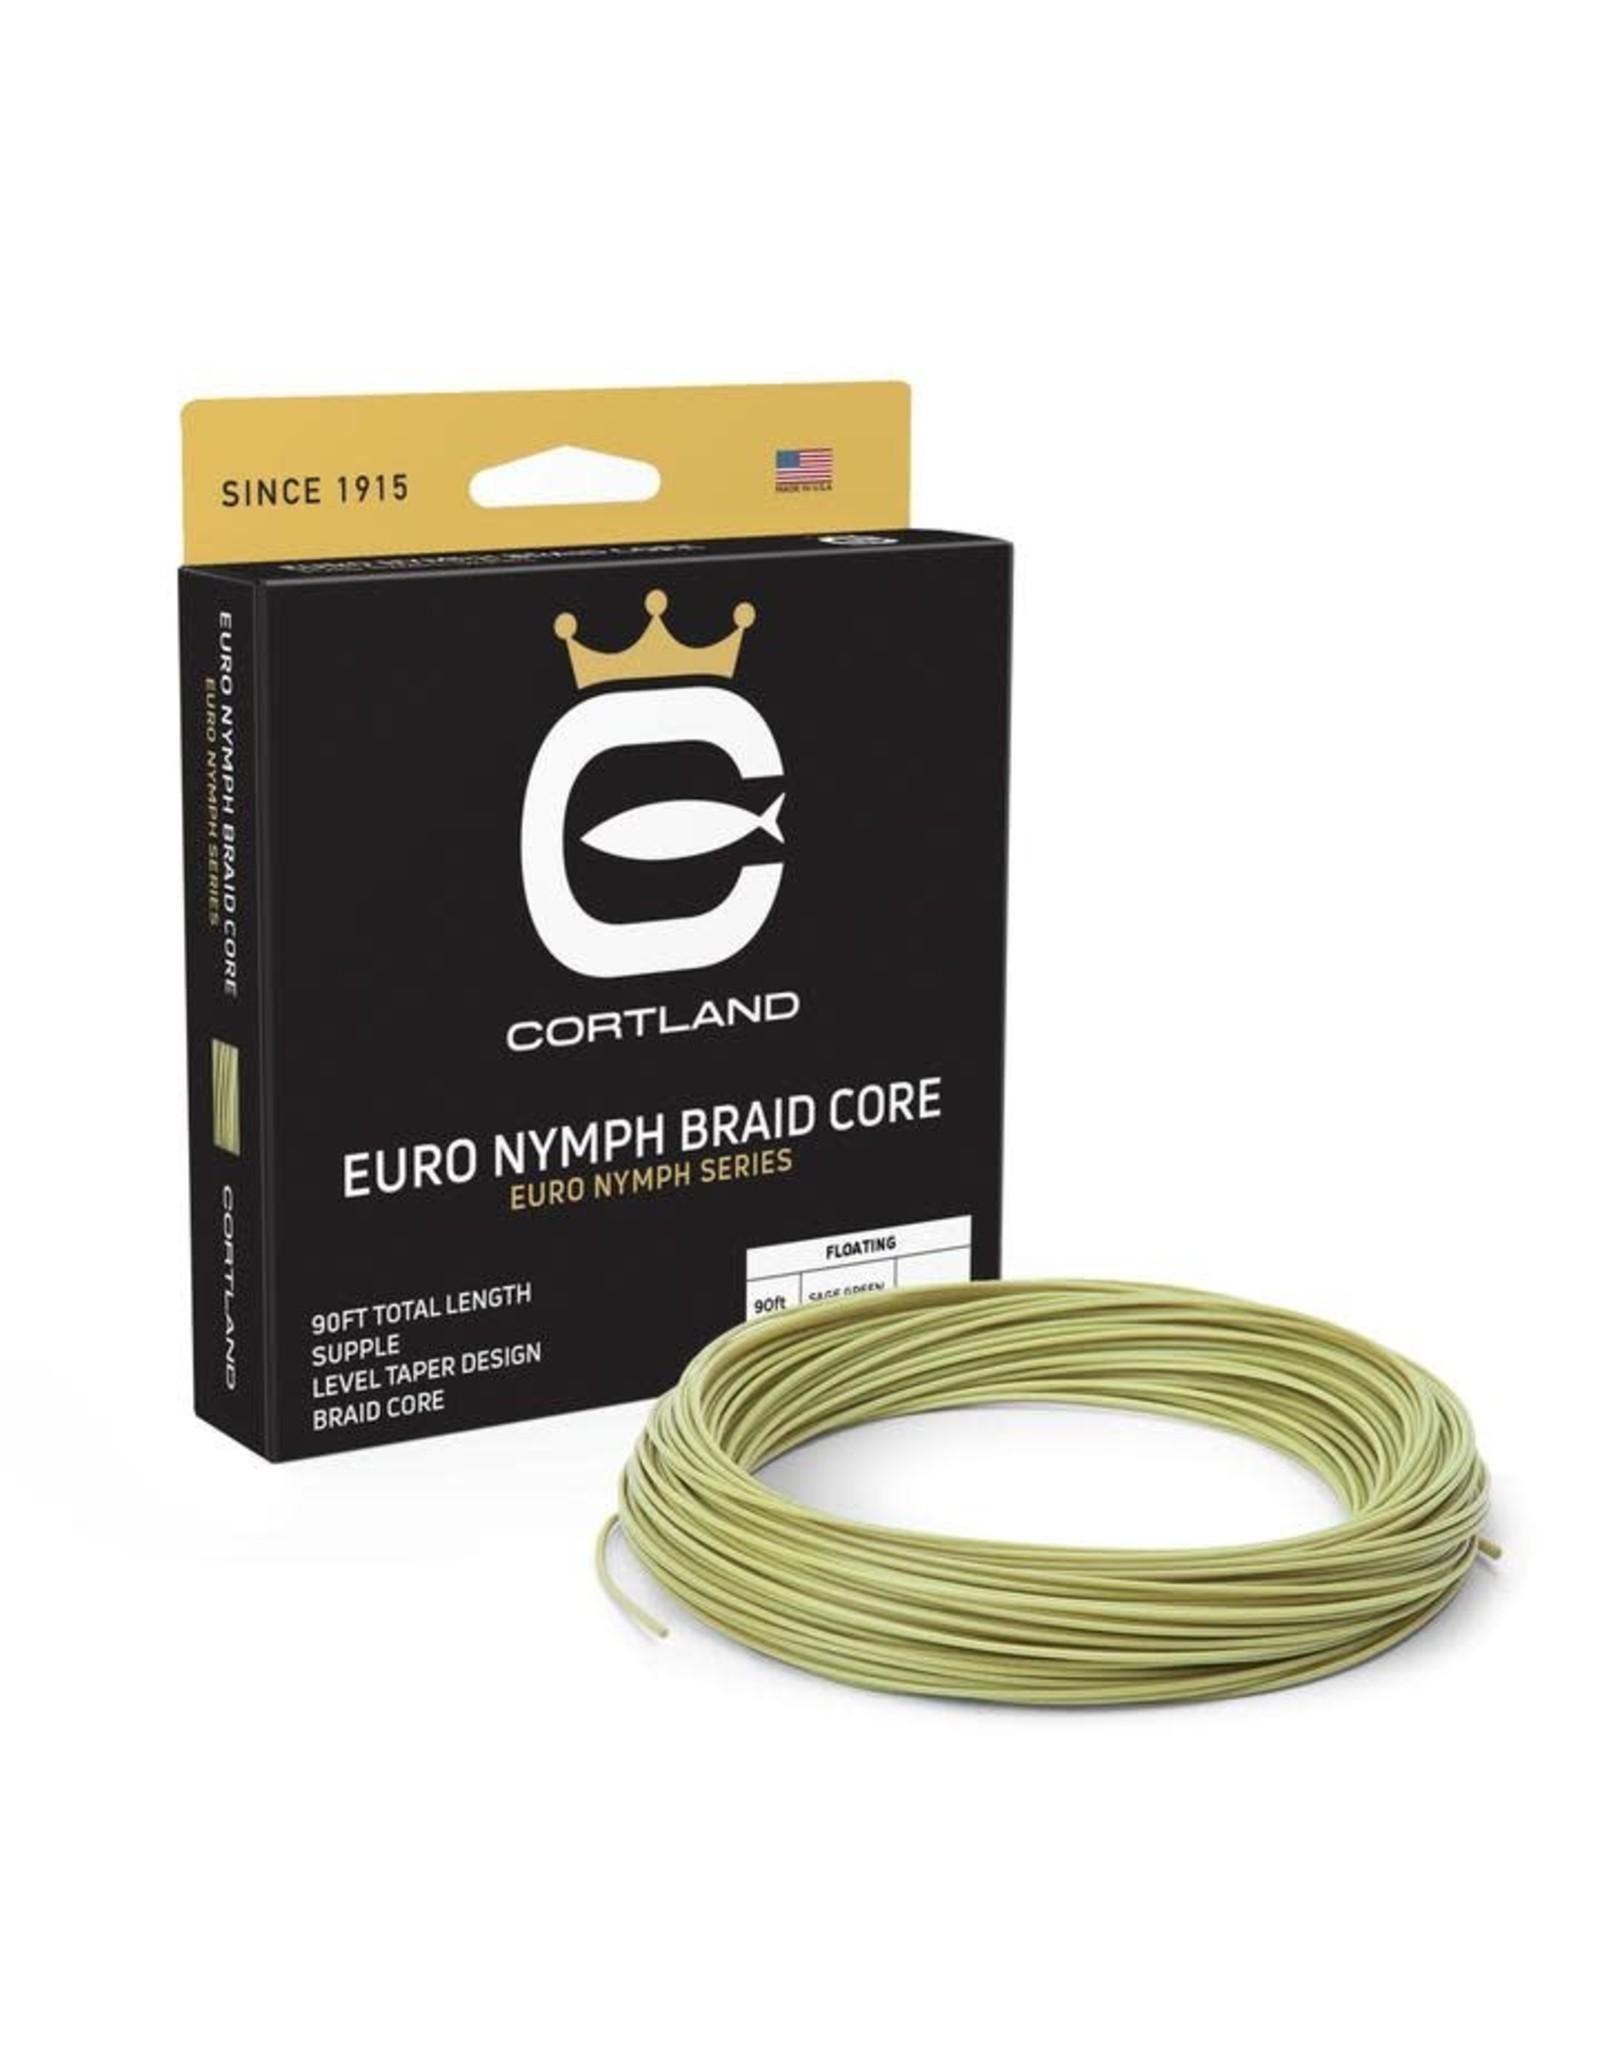 Cortland Line Cortland Euro Nymph Braid Core